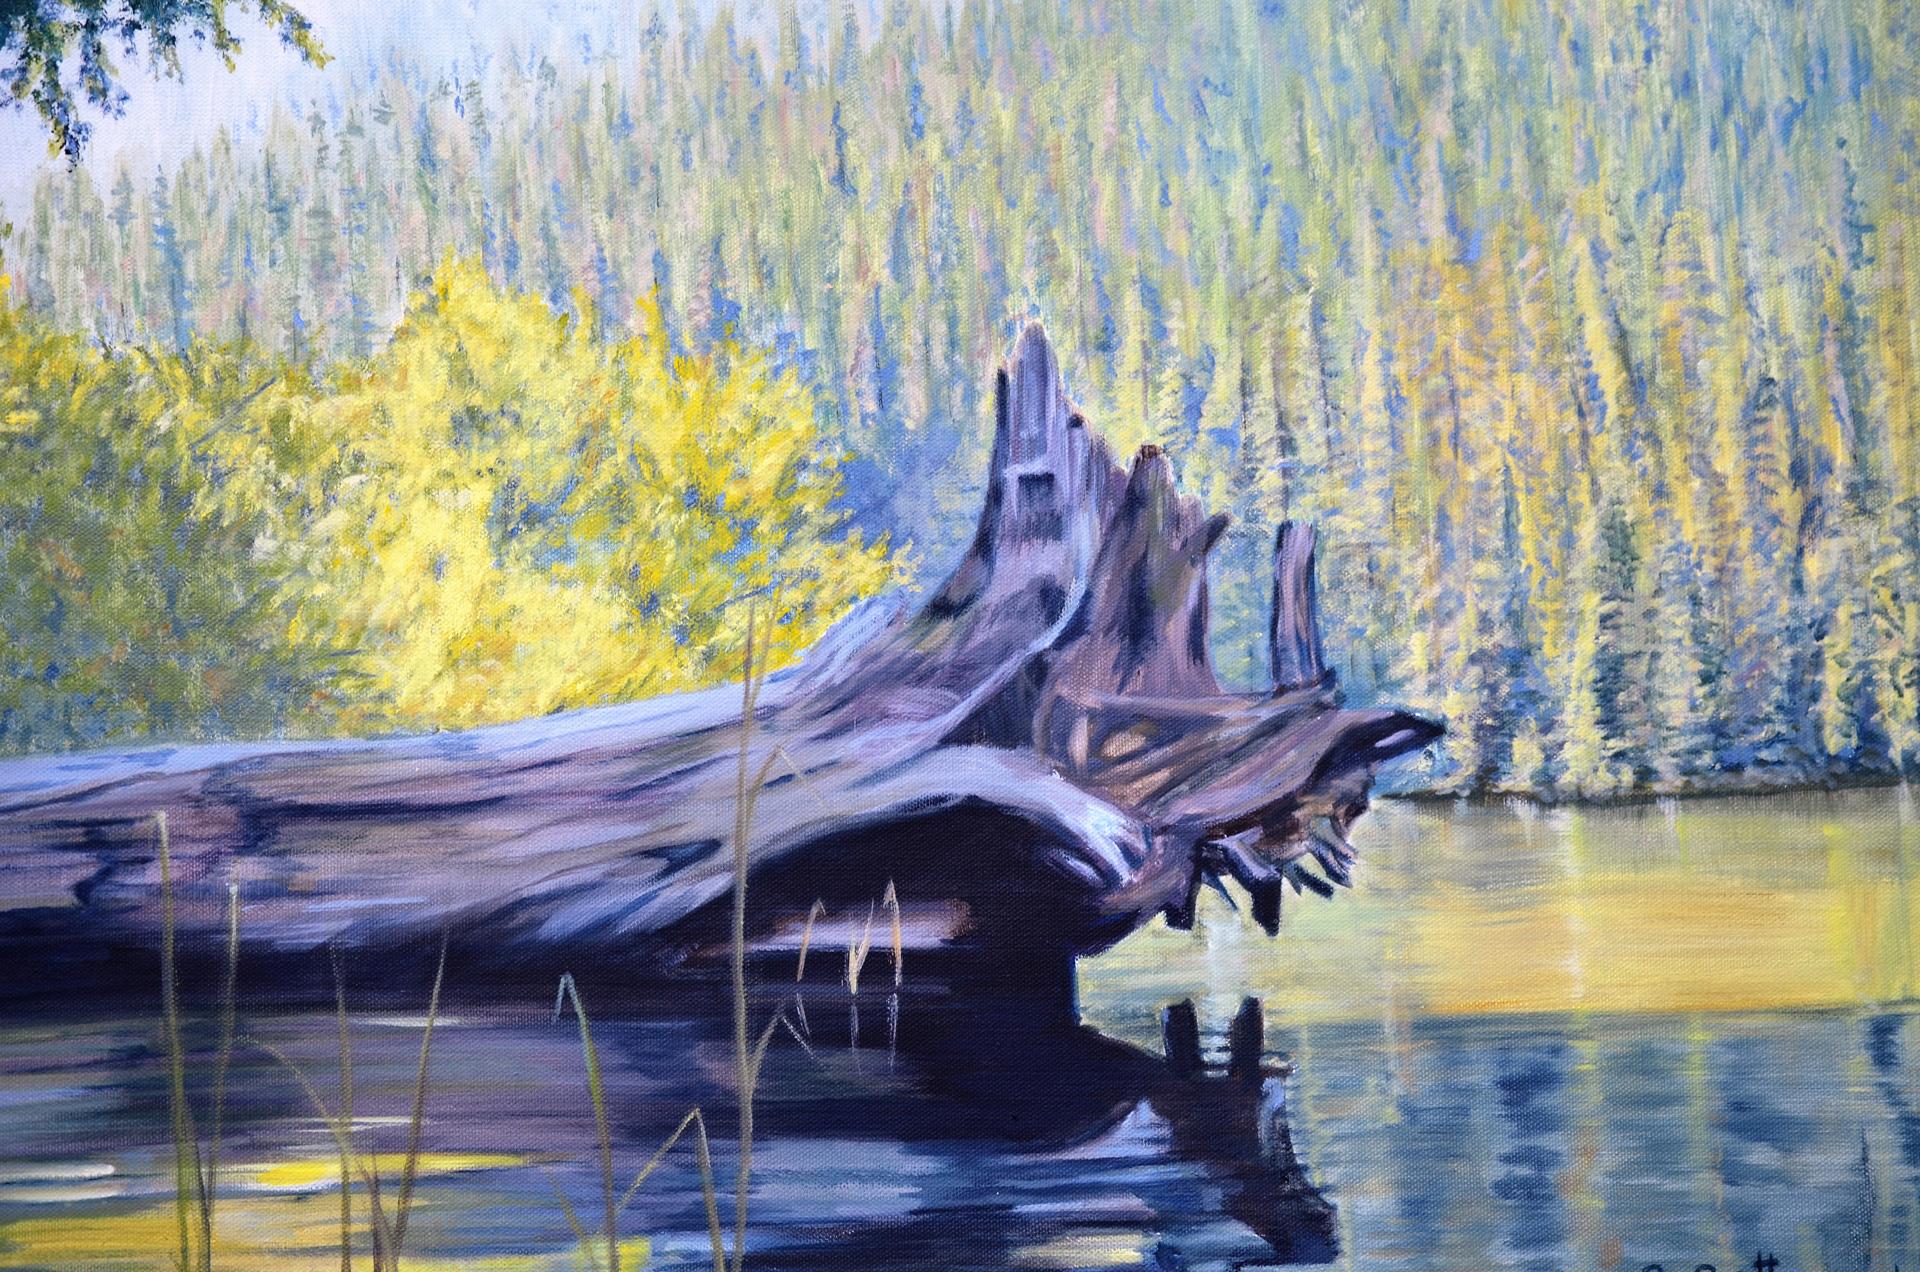 Nahatlatch Lake, B.C - Oil Painting by Sandra Cattermole